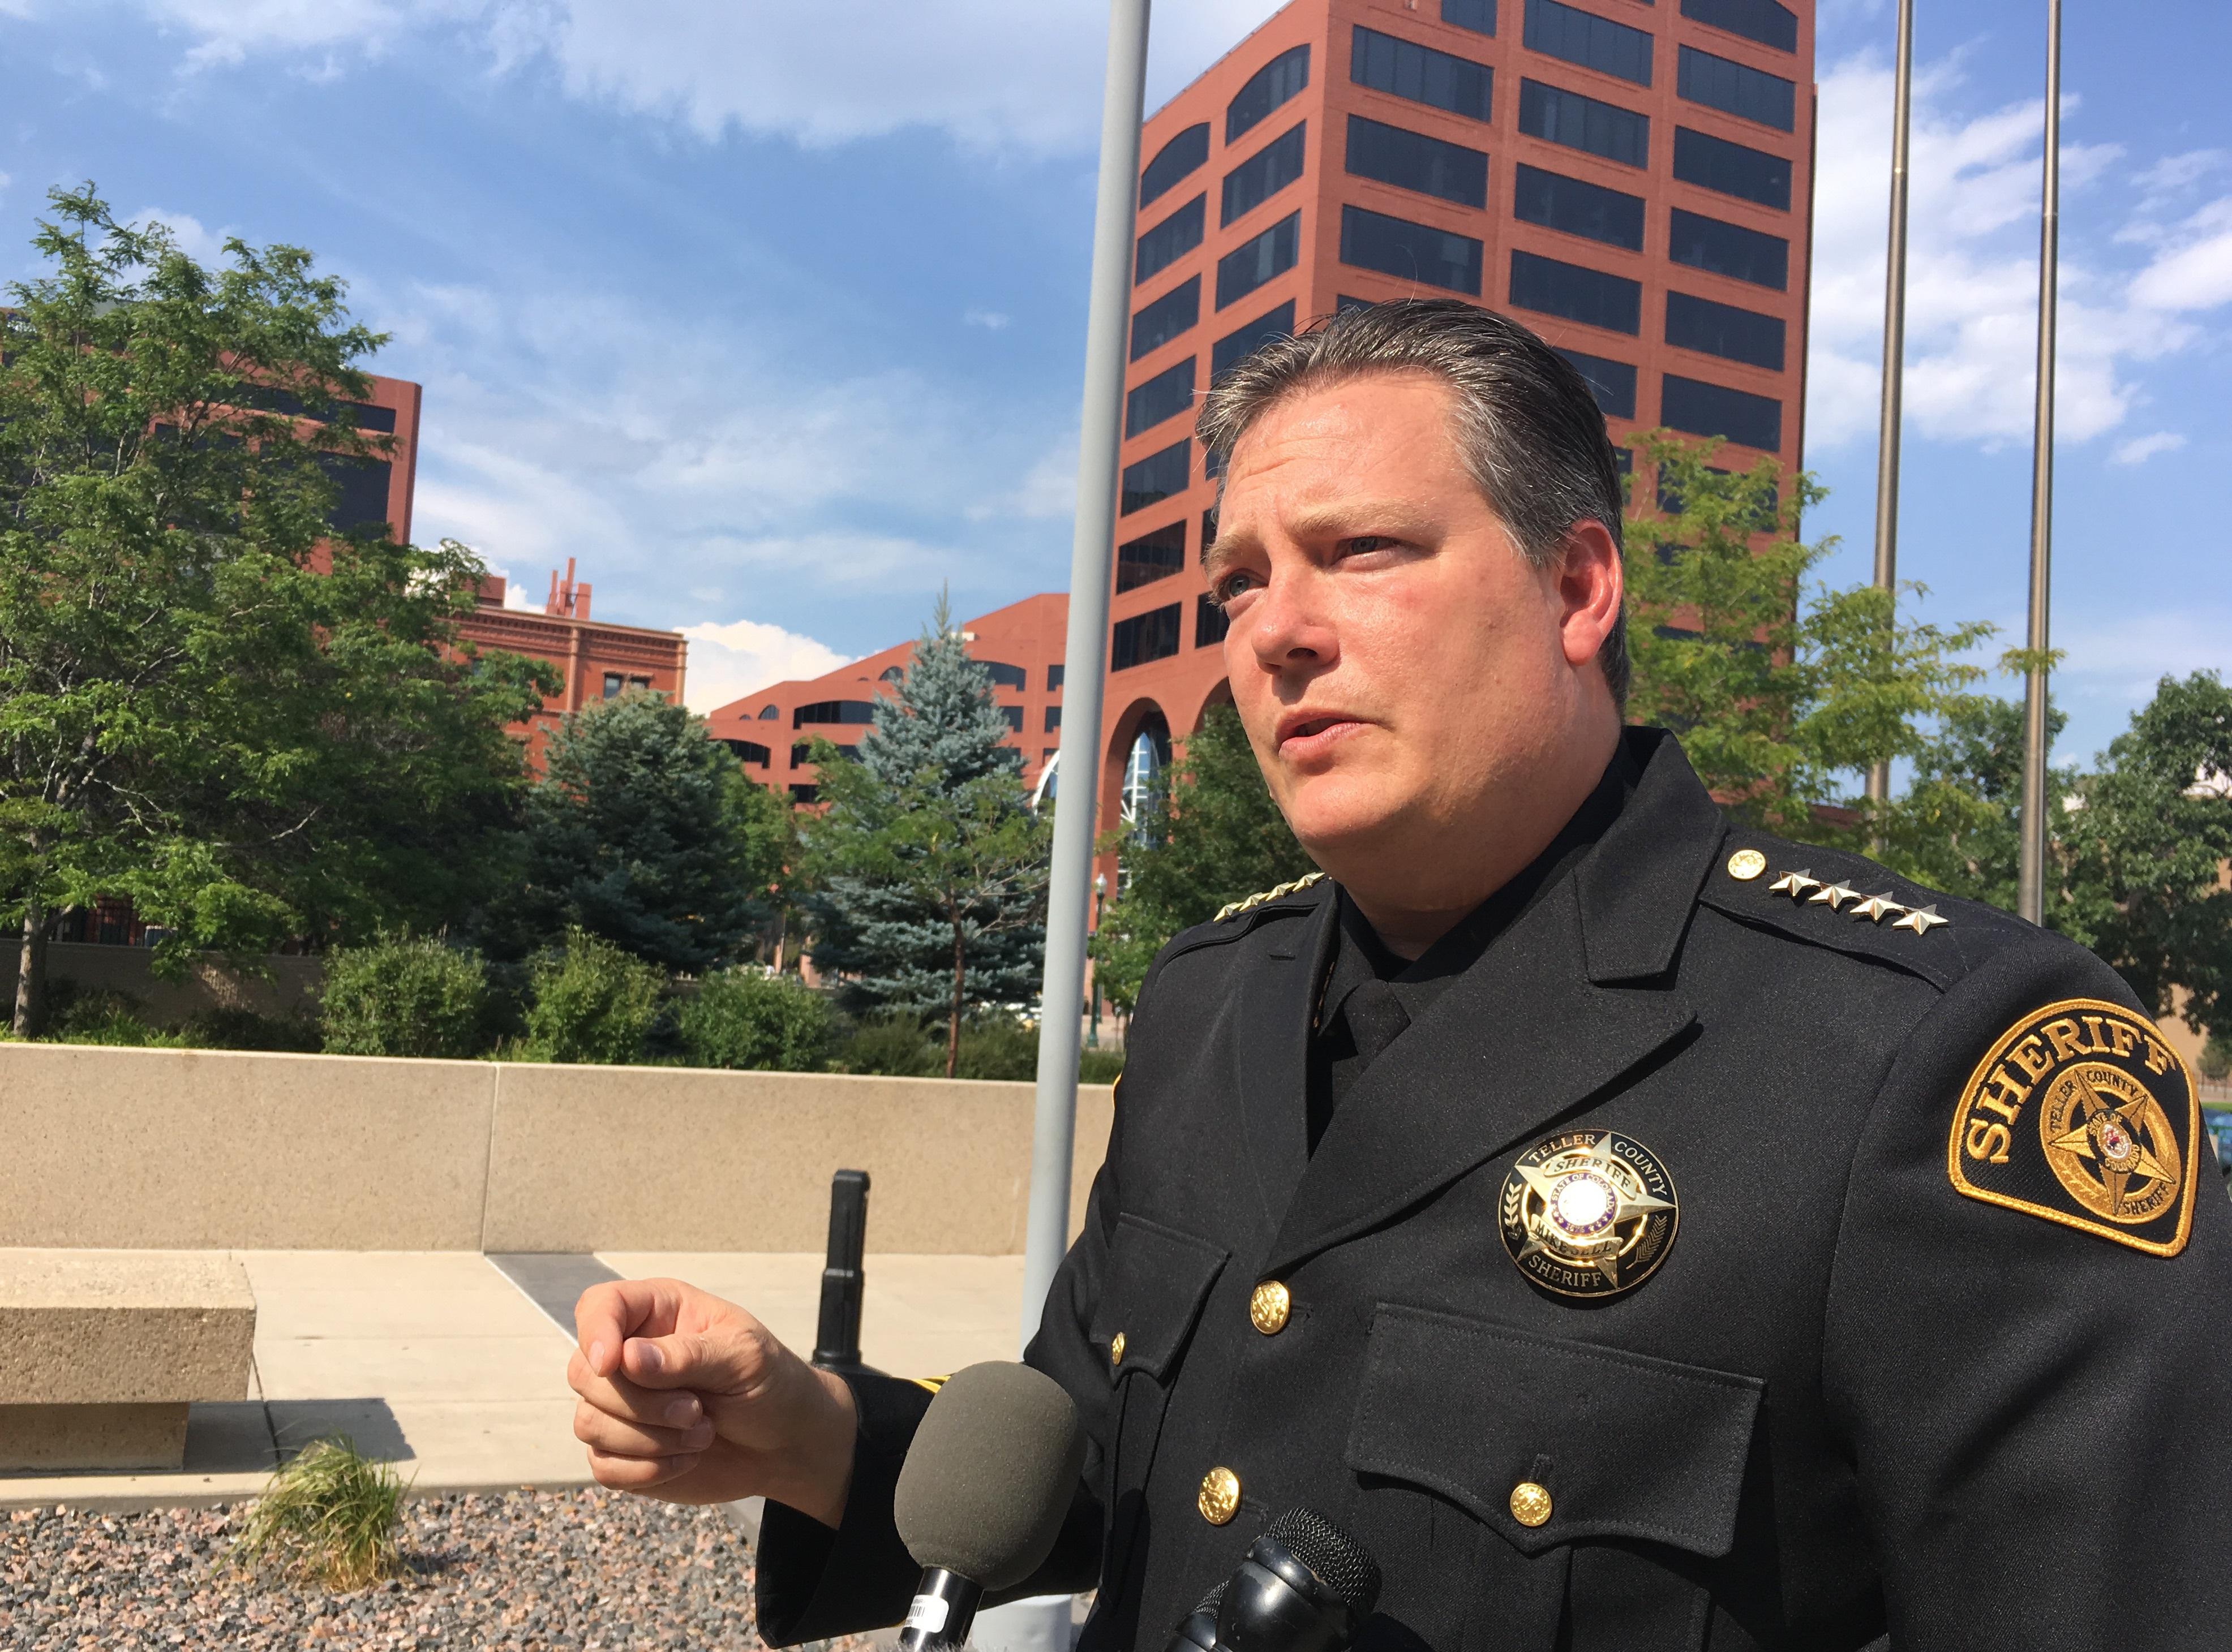 Photo: Teller County Sheriff Jason Mikesell